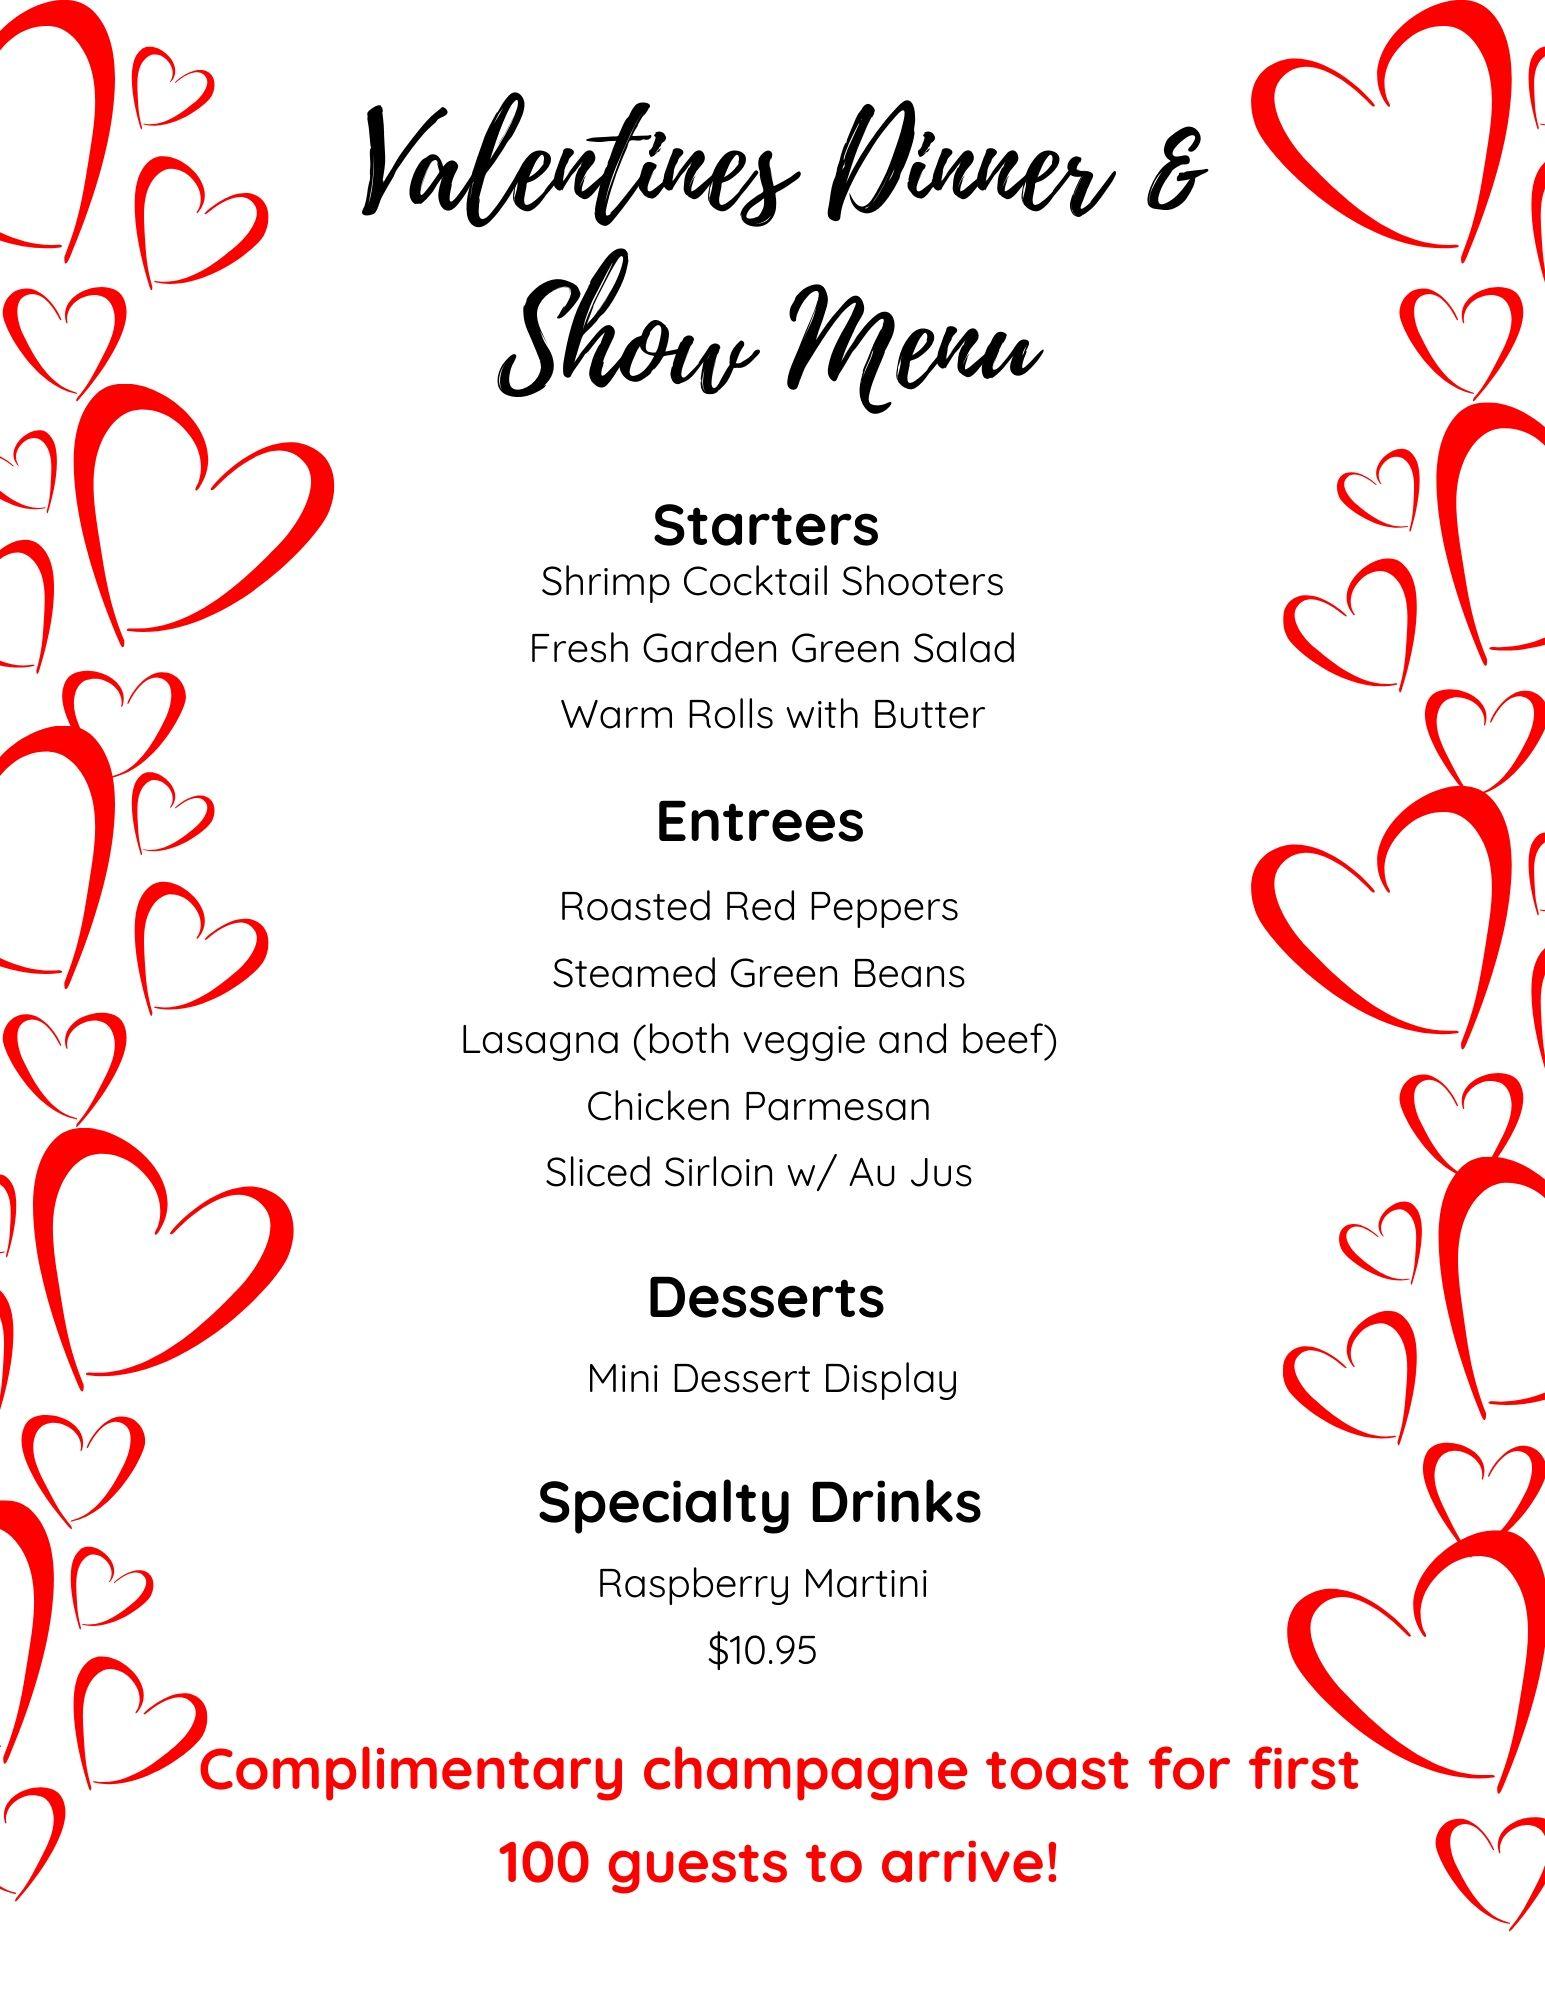 Big and Tall Comedy Tour Valentines Show Hyatt Place Niagara Falls